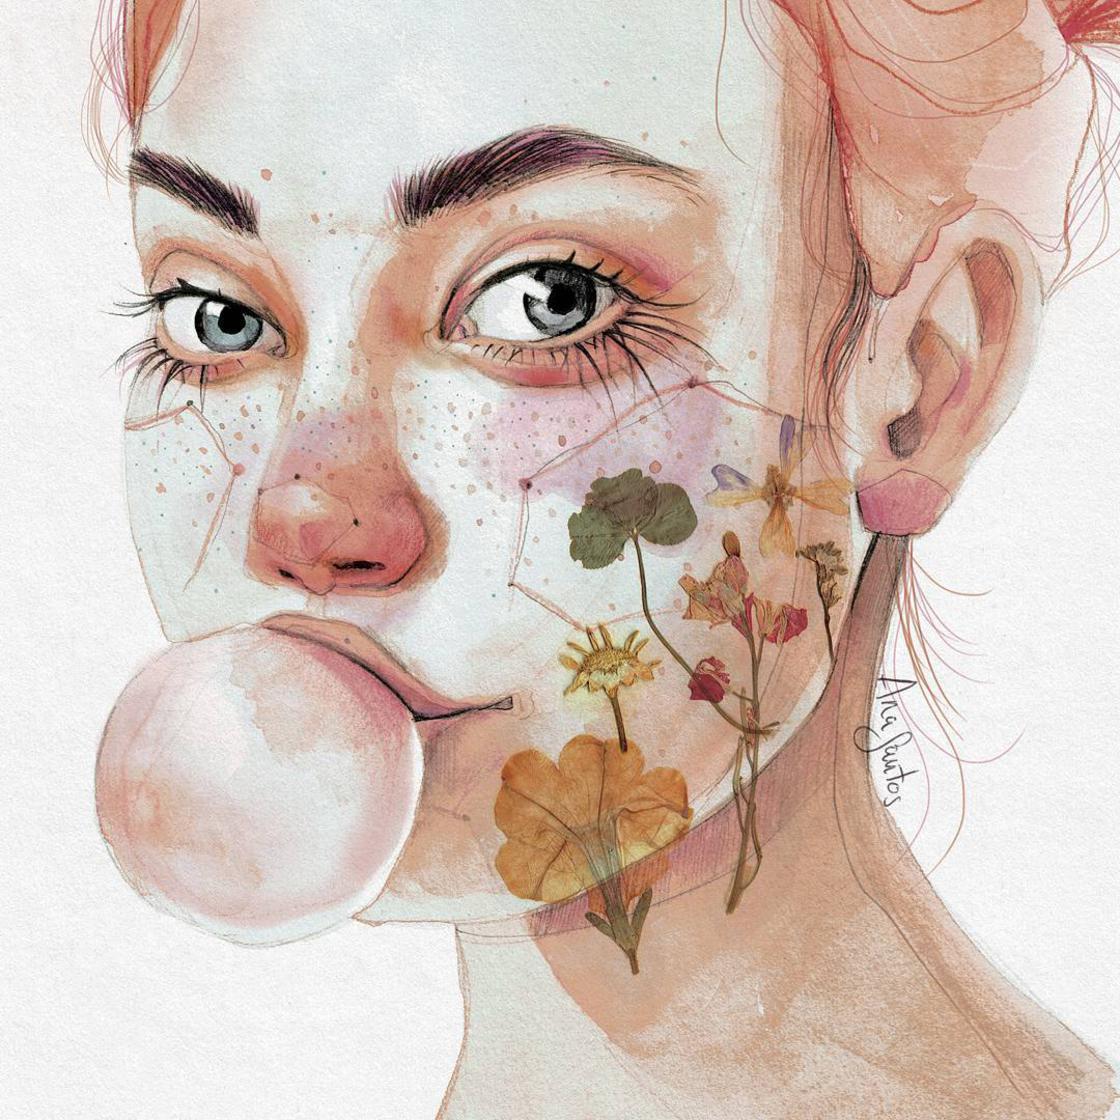 Natural Girls – Les portraits doux et sensuels d'Ana Santos (24 pics)